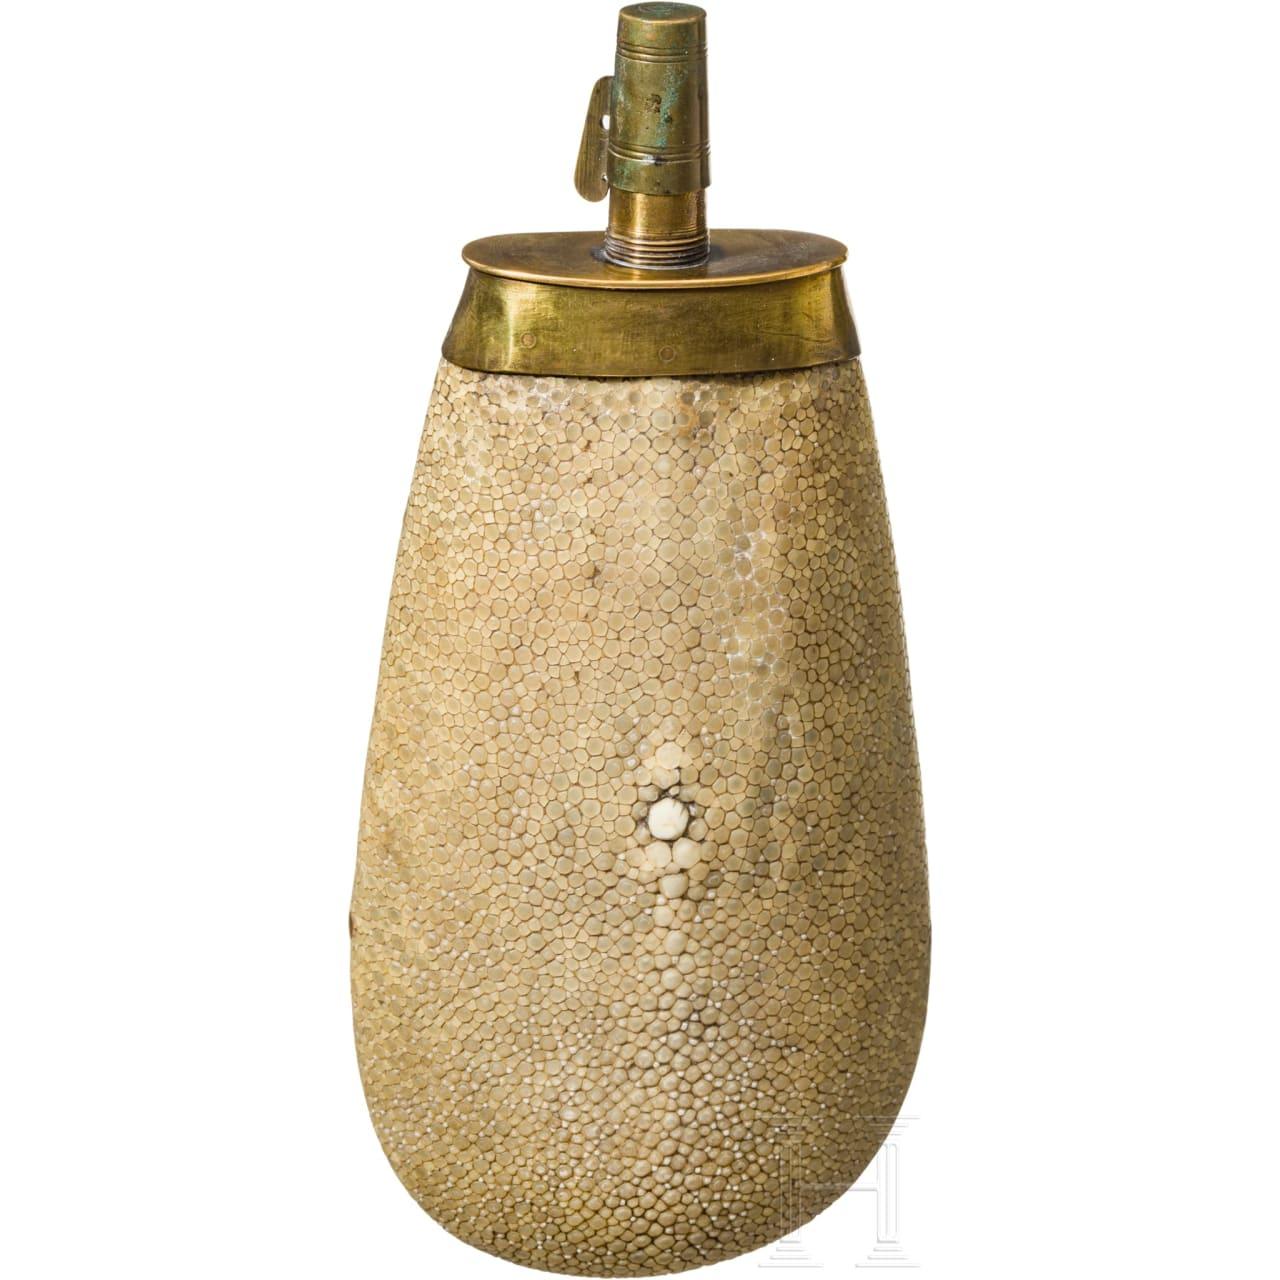 A rayskin covered powder flask, France, 18th century